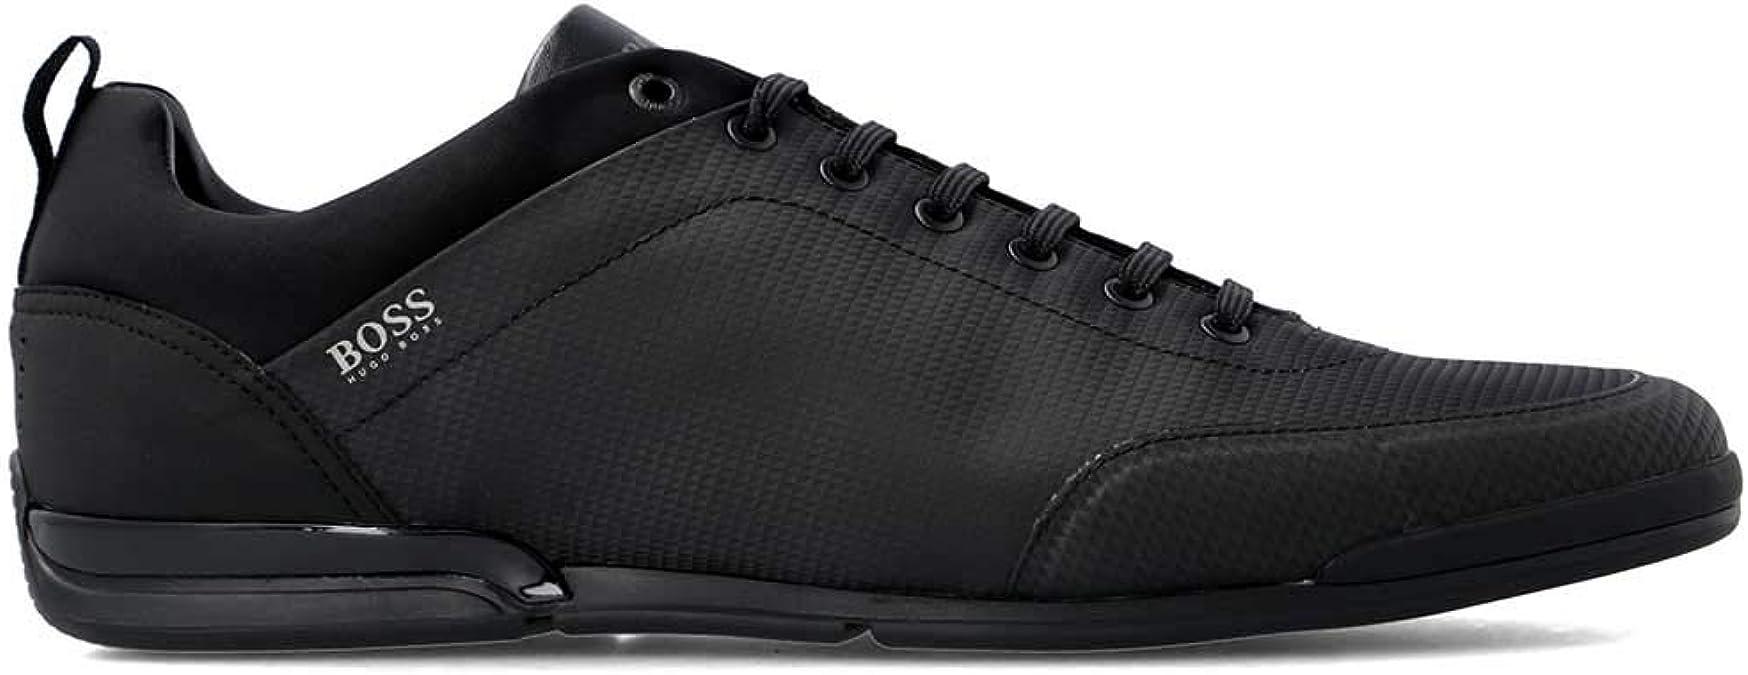 Hugo Boss Mens Fashion Sneakers Saturn Lowp nyth Black 50408051 001